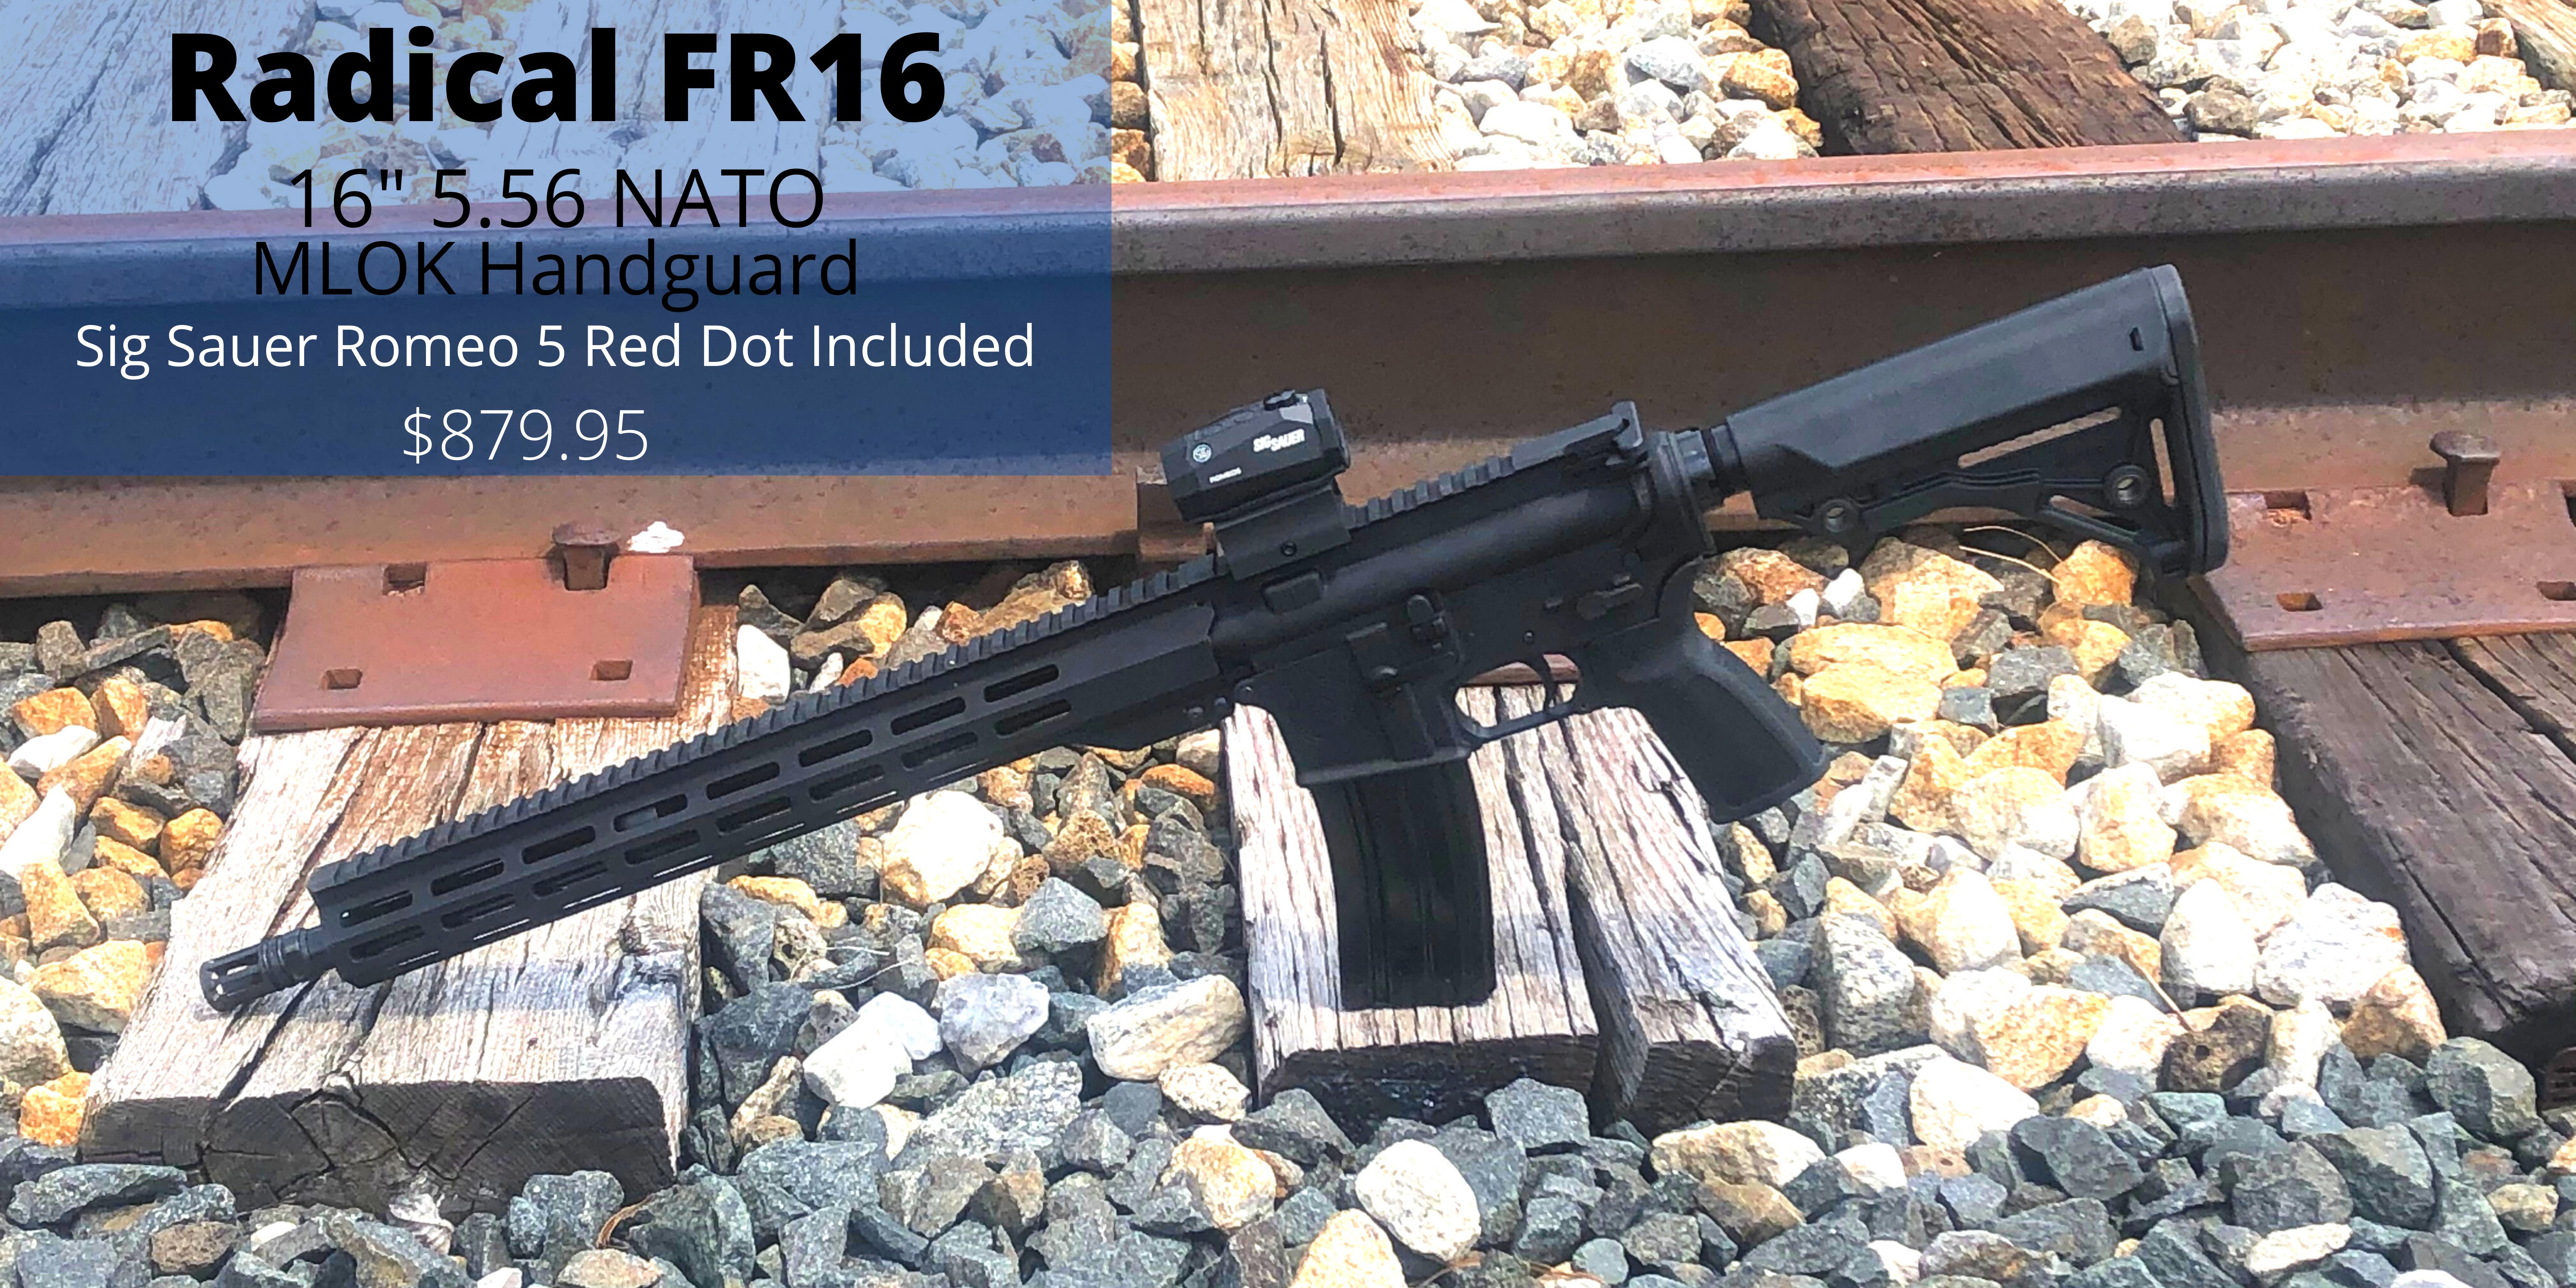 https://www.ronandjosfirearms.com/products/radical-firearms-rf00020-816903025183-632